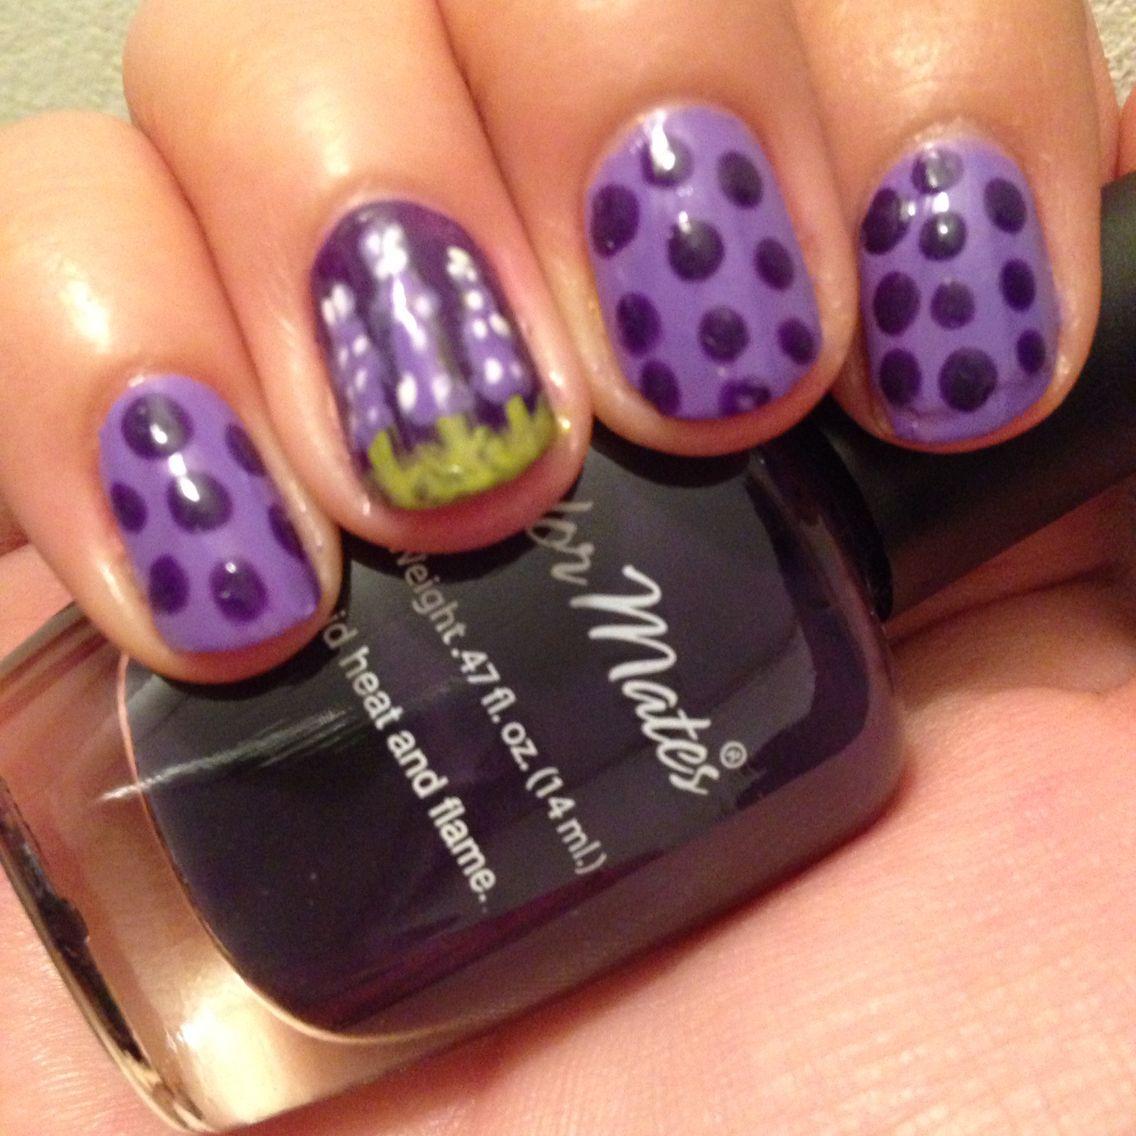 Delphinium nail art July day 13 | Stuff I\'ve Done | Pinterest ...